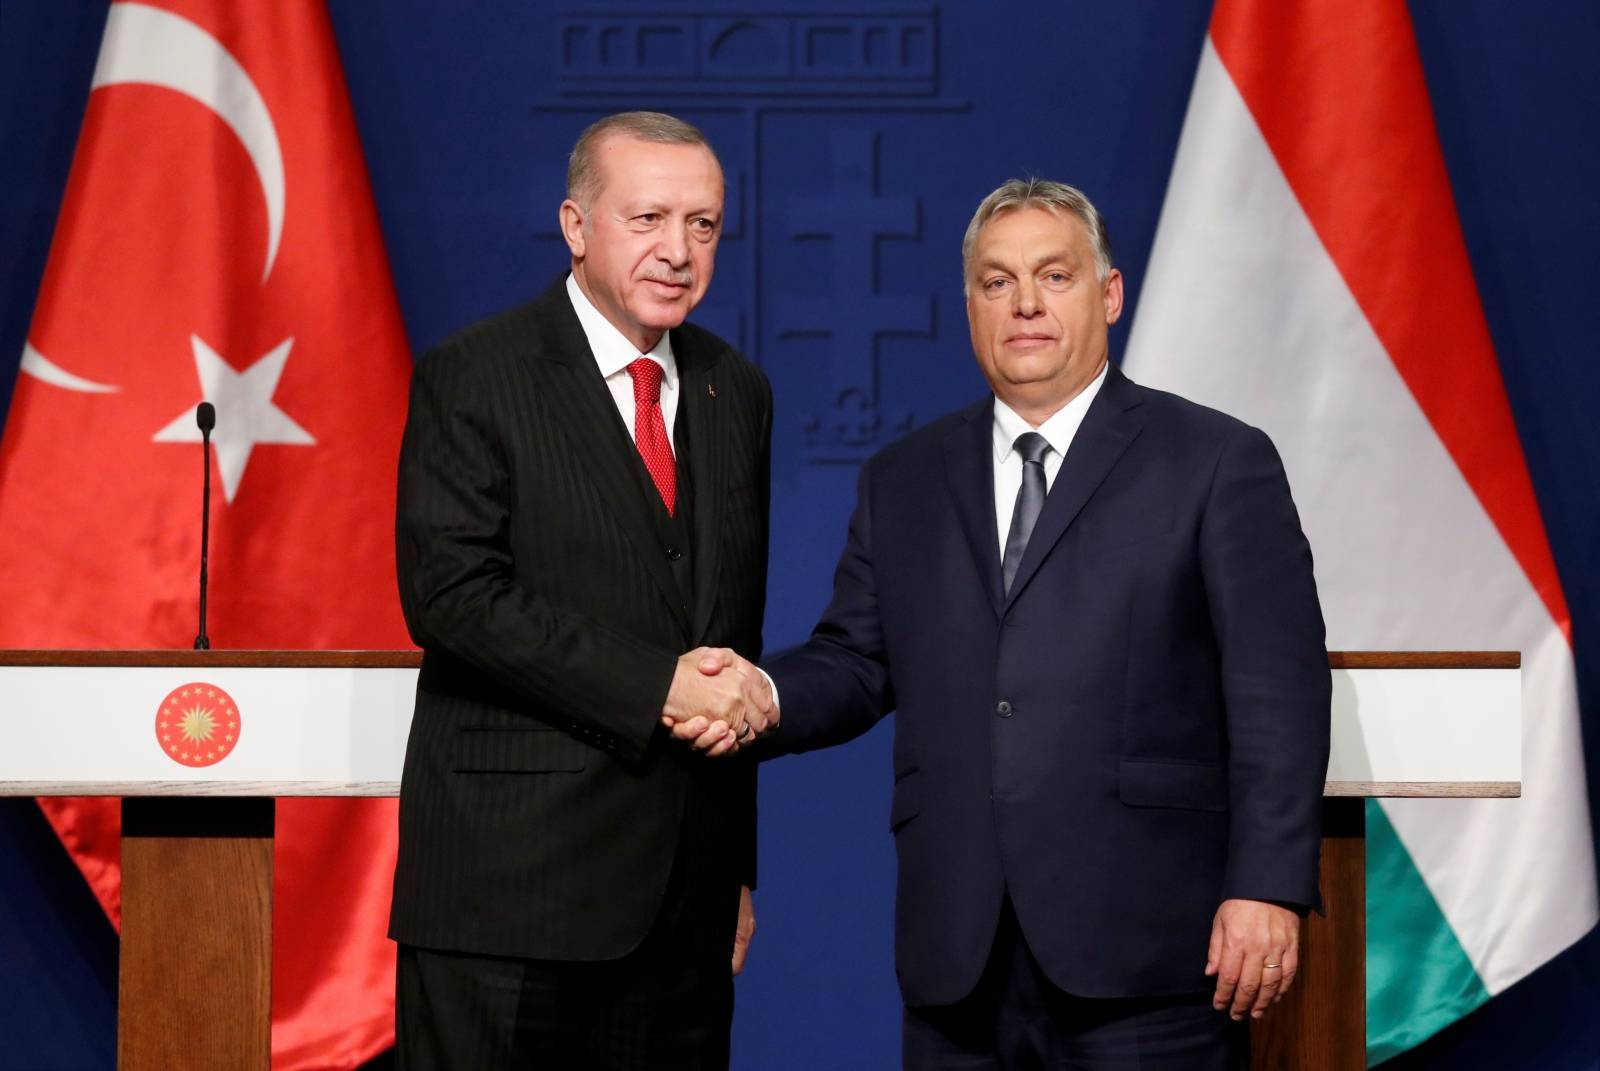 Turkish President Recep Tayyip Erdogan visits Hungary